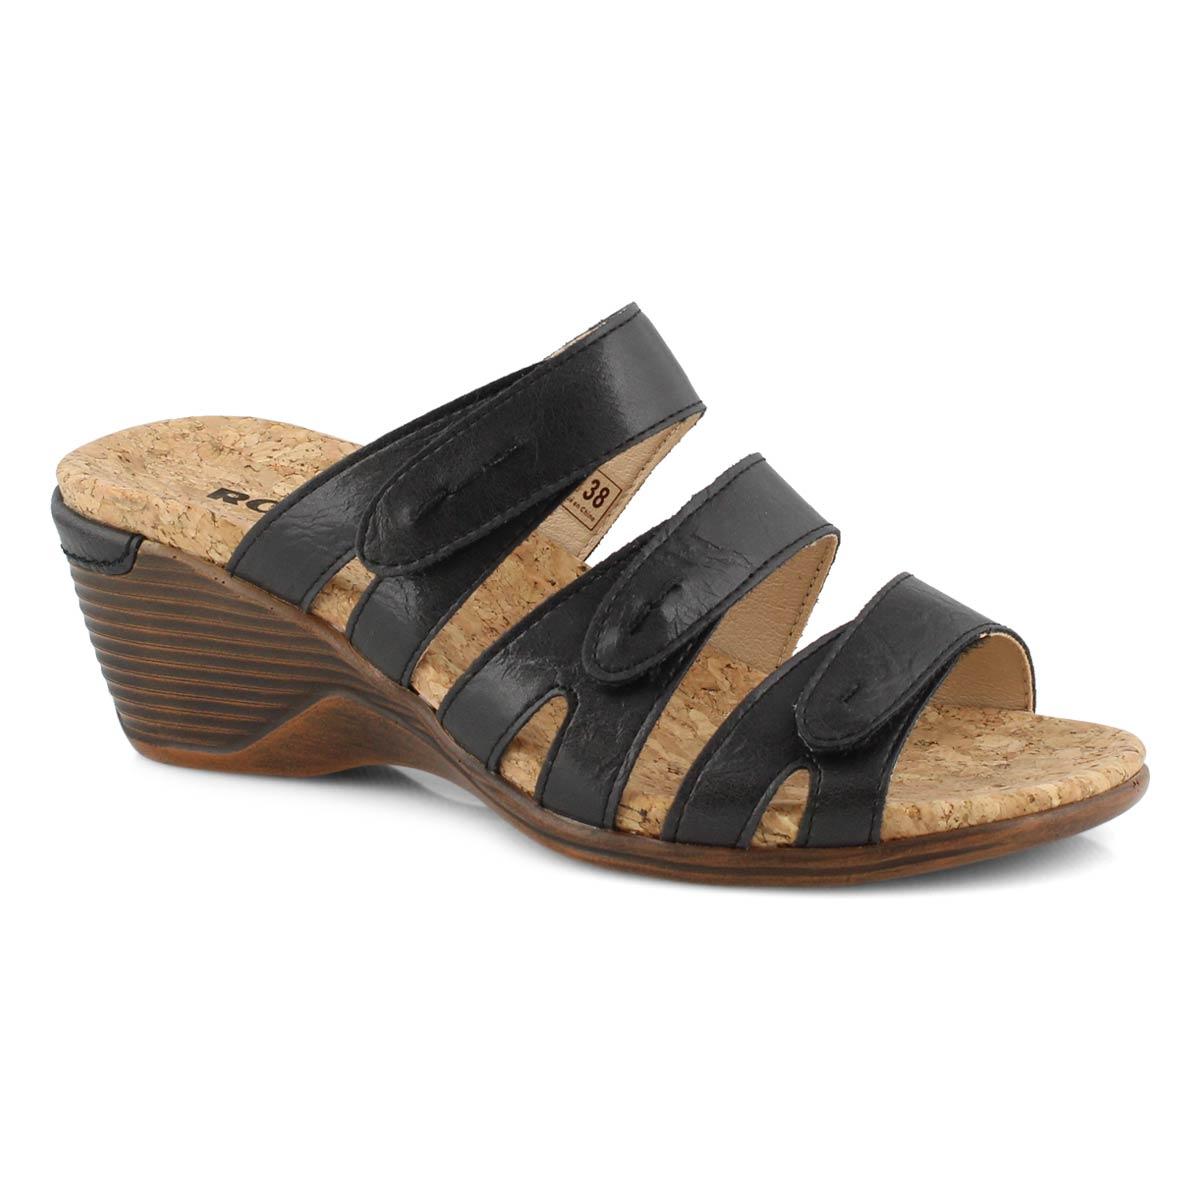 Lds Calgary 01 black wedge sandal